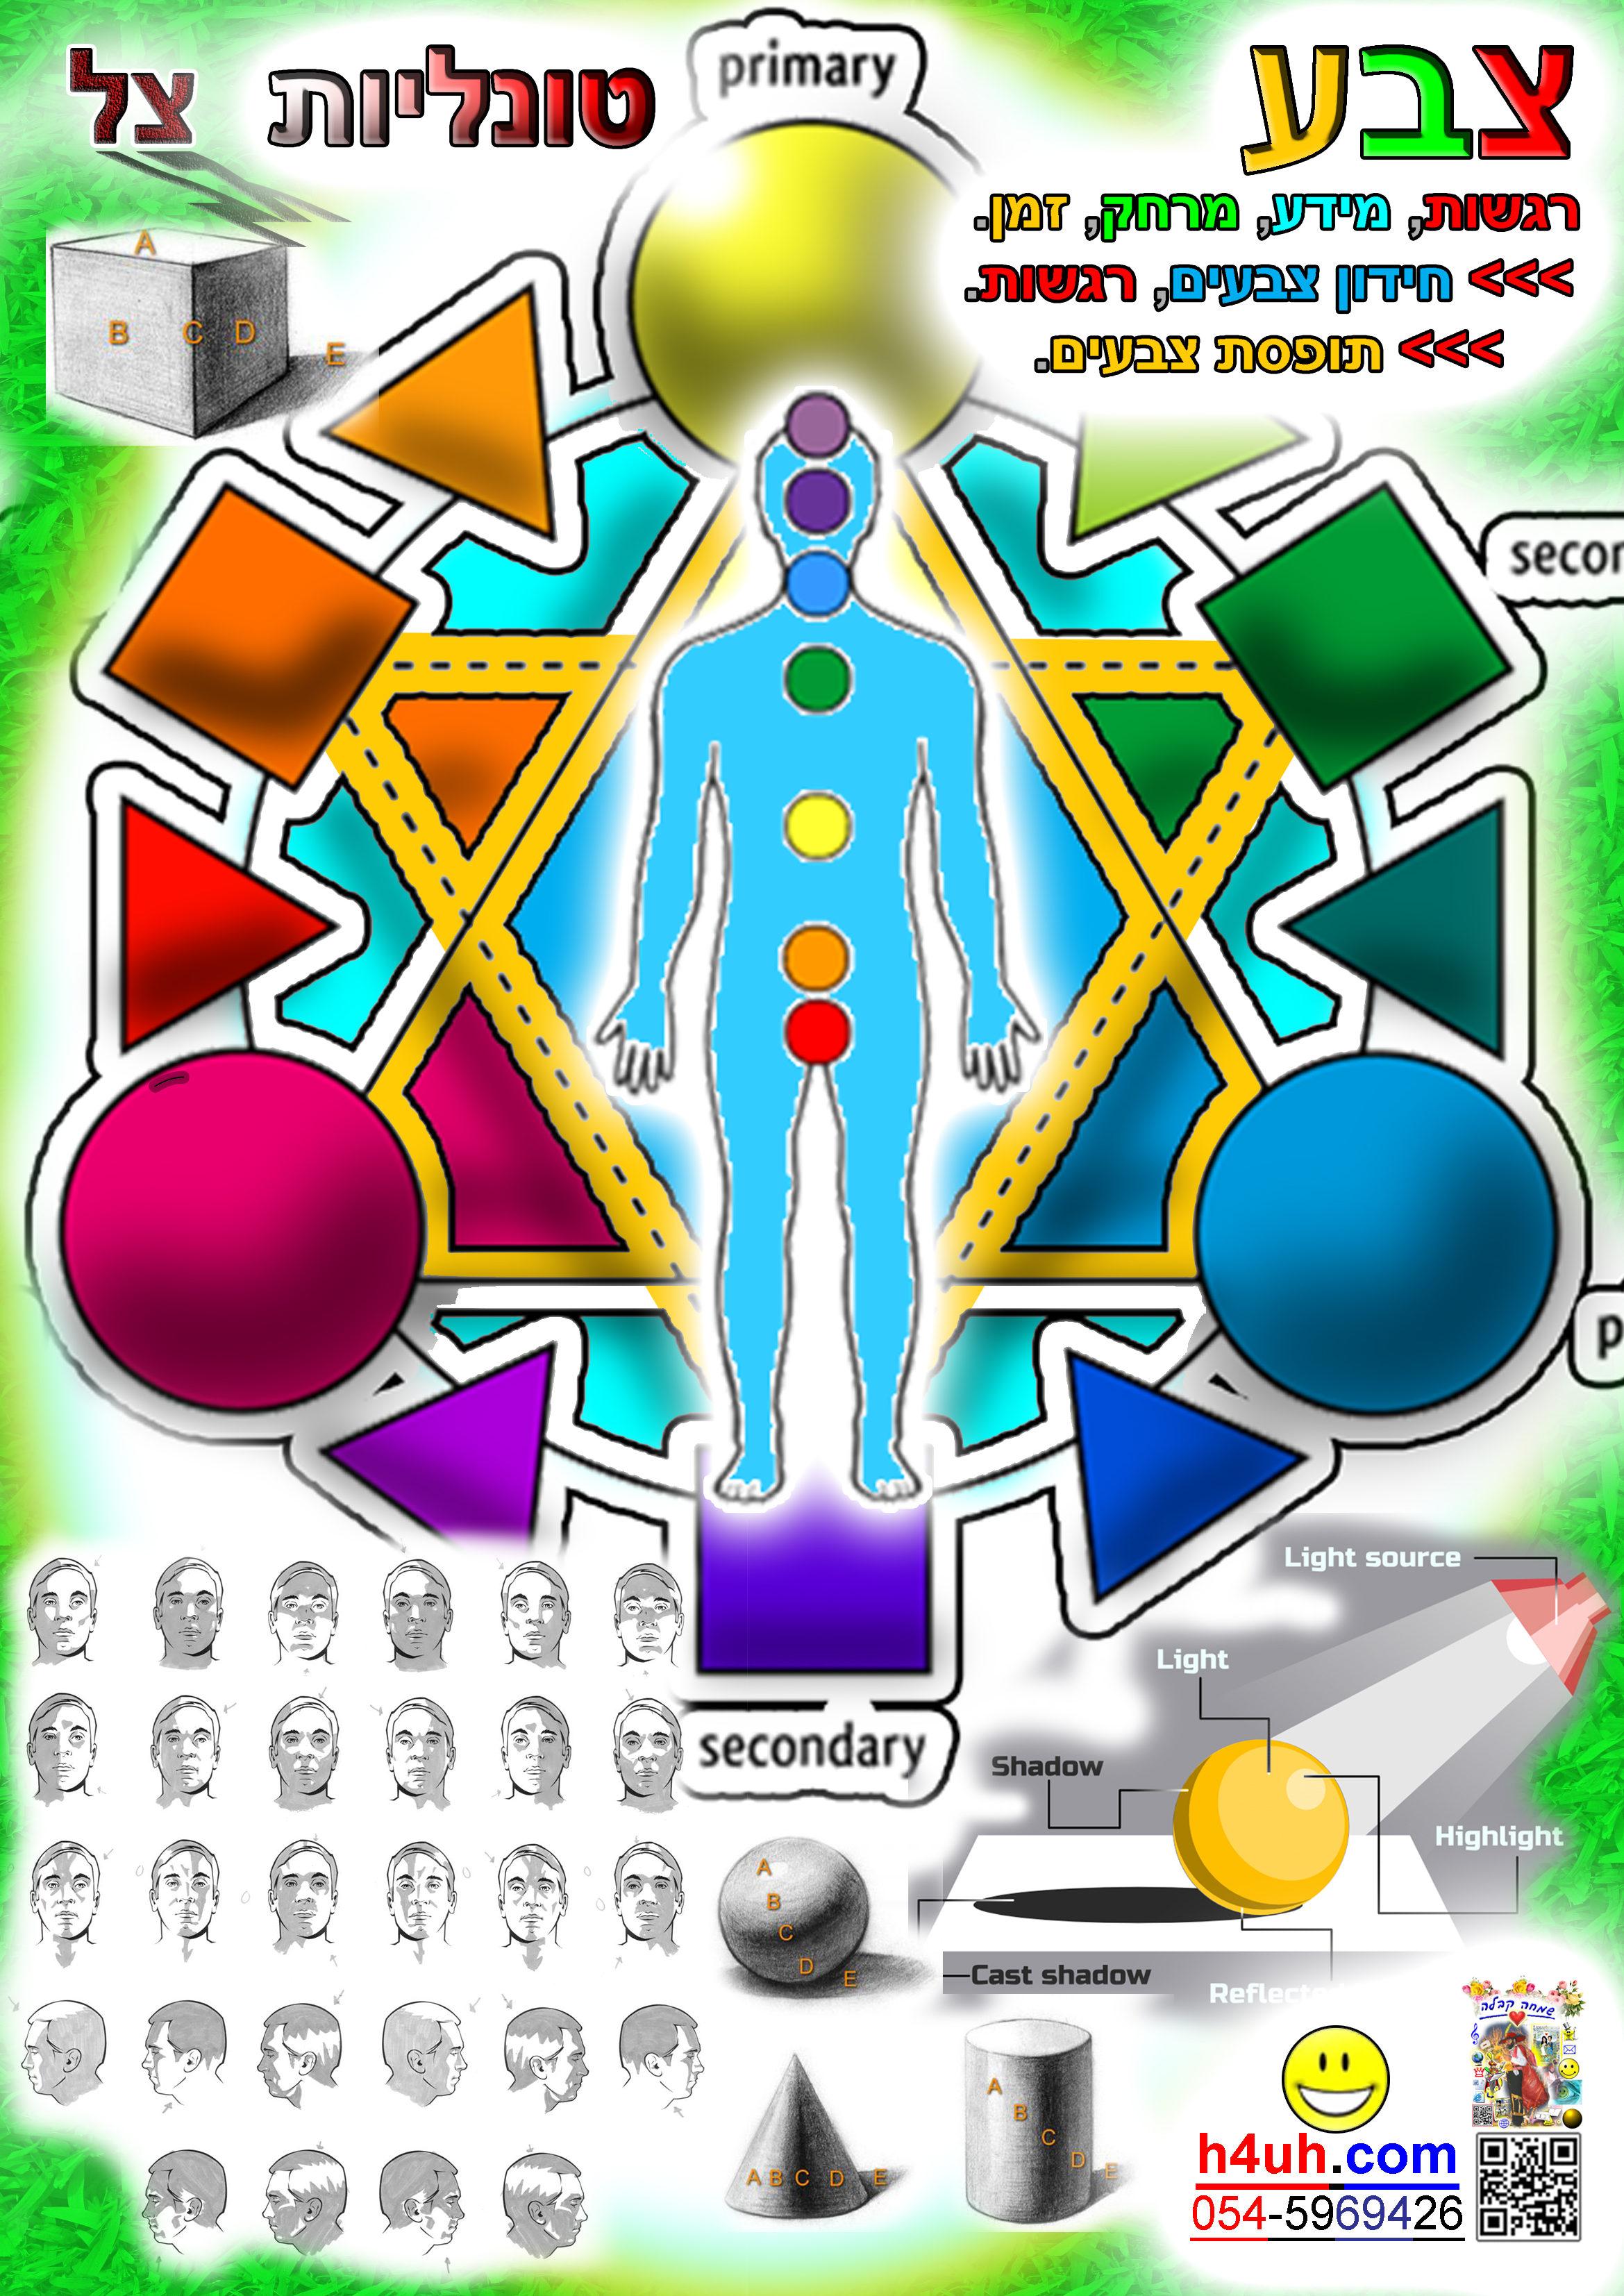 art;tutorial;drawing;painting;study;Learning;teaching;teacher;training;poster;colors;idea;elements;location;composition;line;shadow;tonality;optical;illusions;Kabbalah;emotions;na;ture;perspective;israel,jerusalem,spirituality,love,god,torah,kabbalah,wisdom,judaism,bible,parshat-hashavua,shabbat